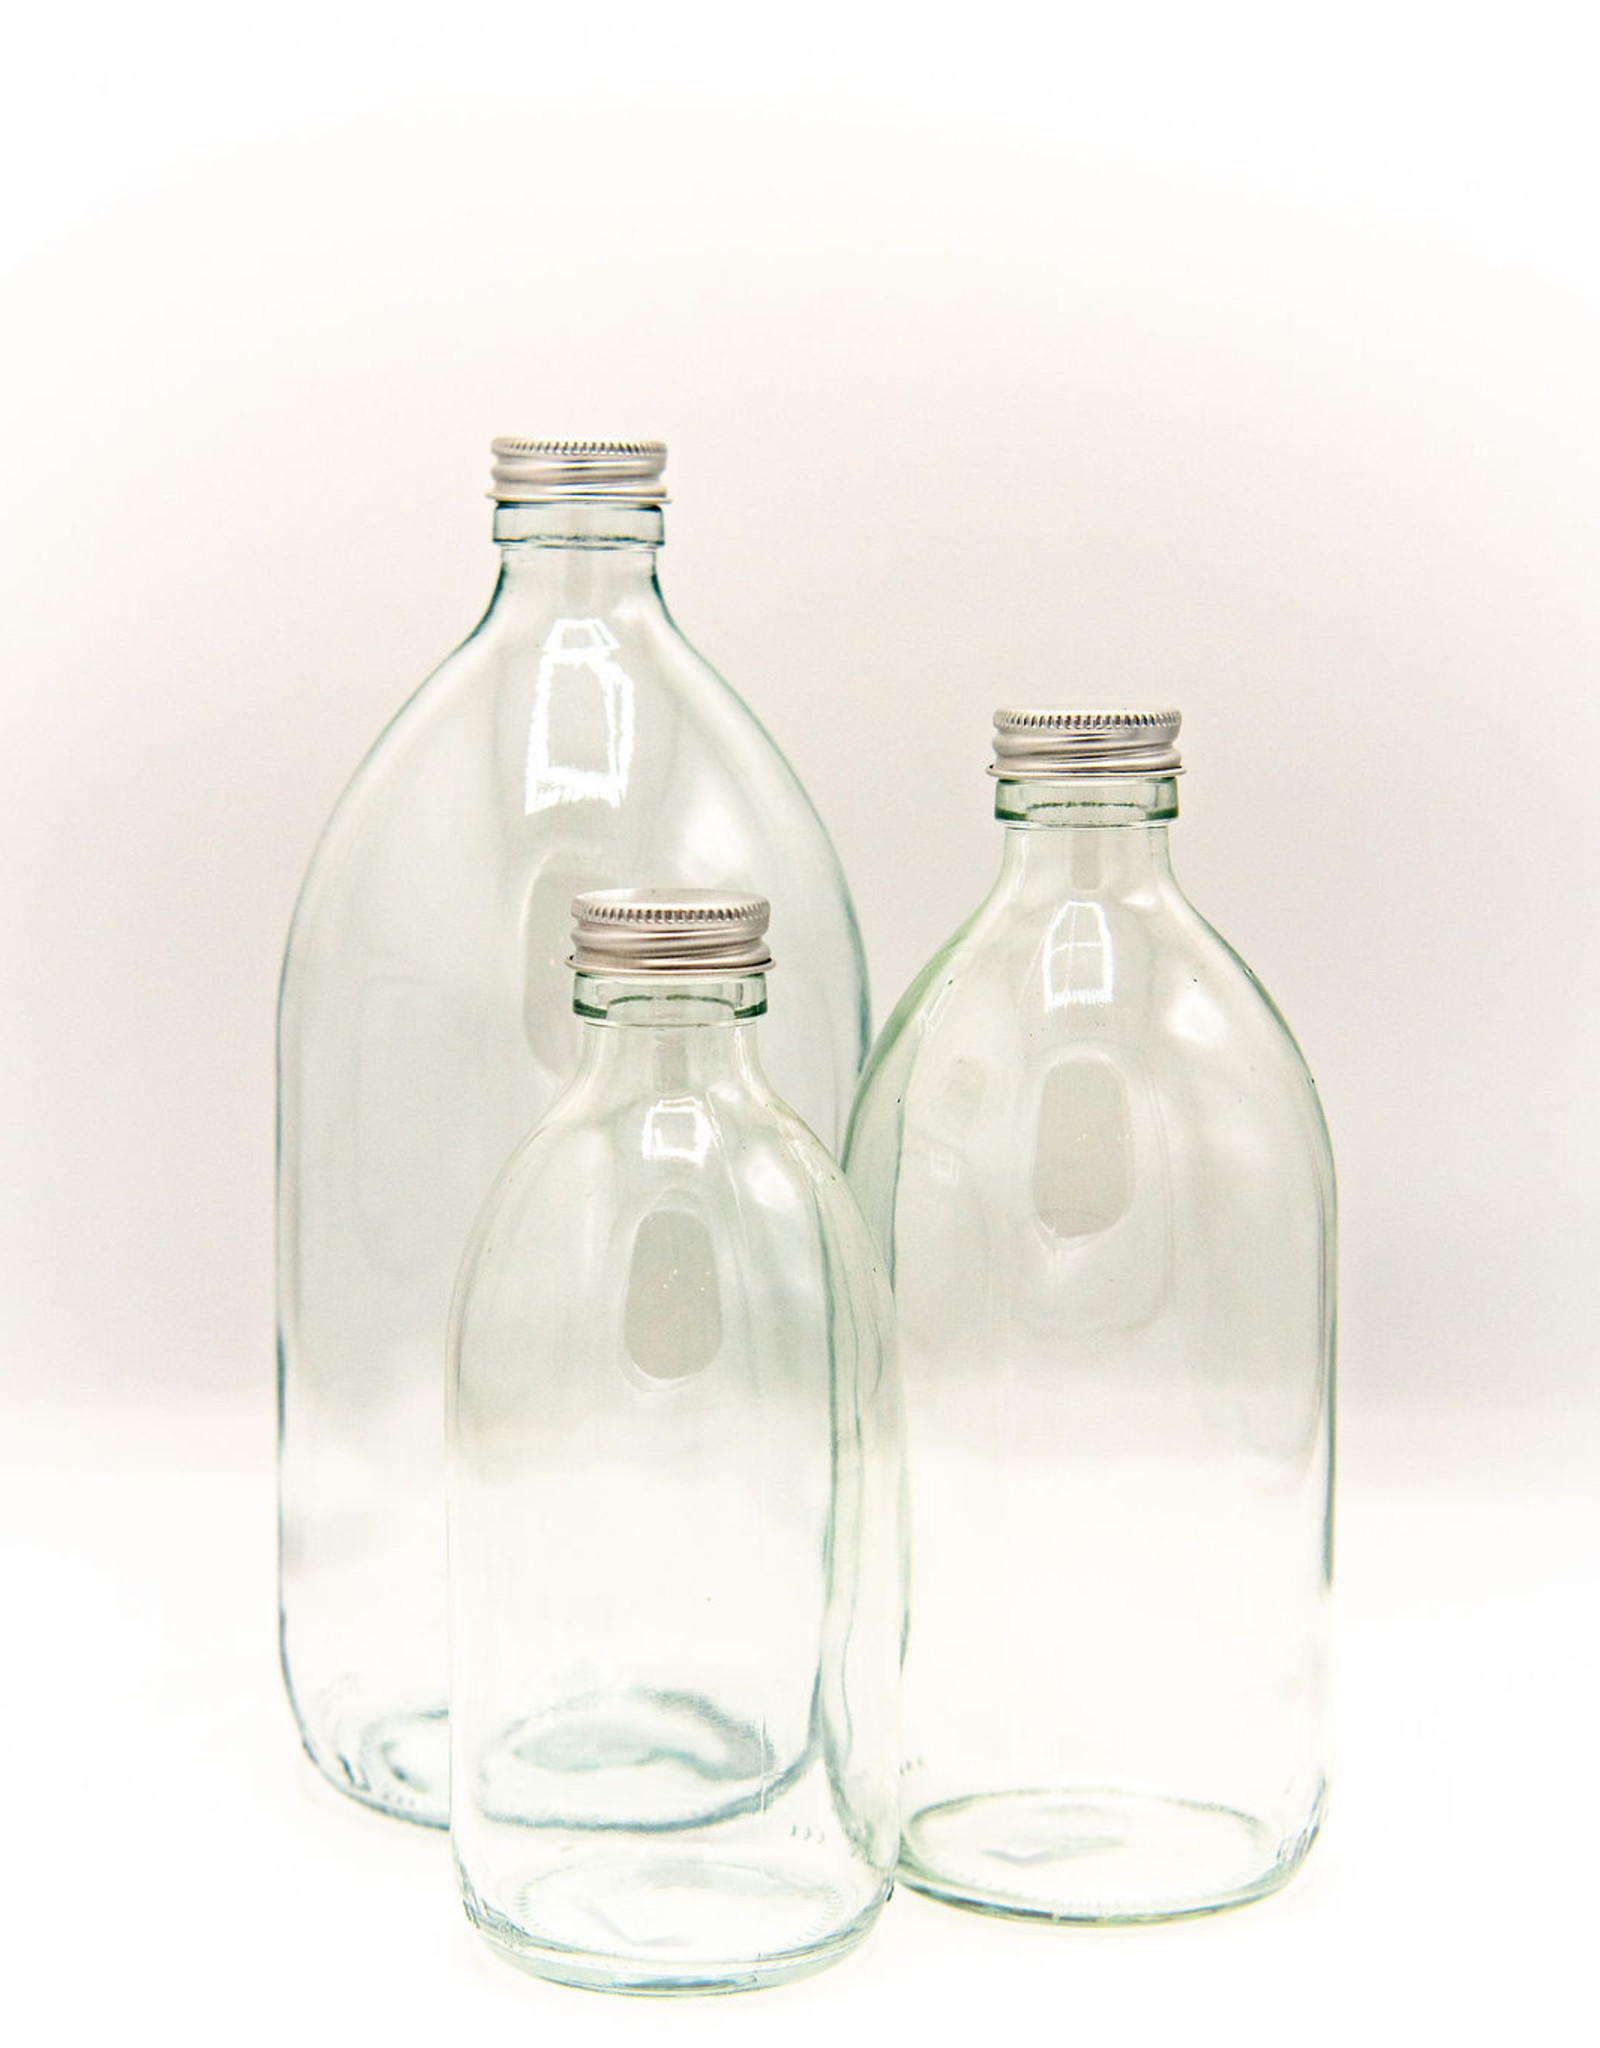 Kuishi Glass refill bottles with aluminium screw cap